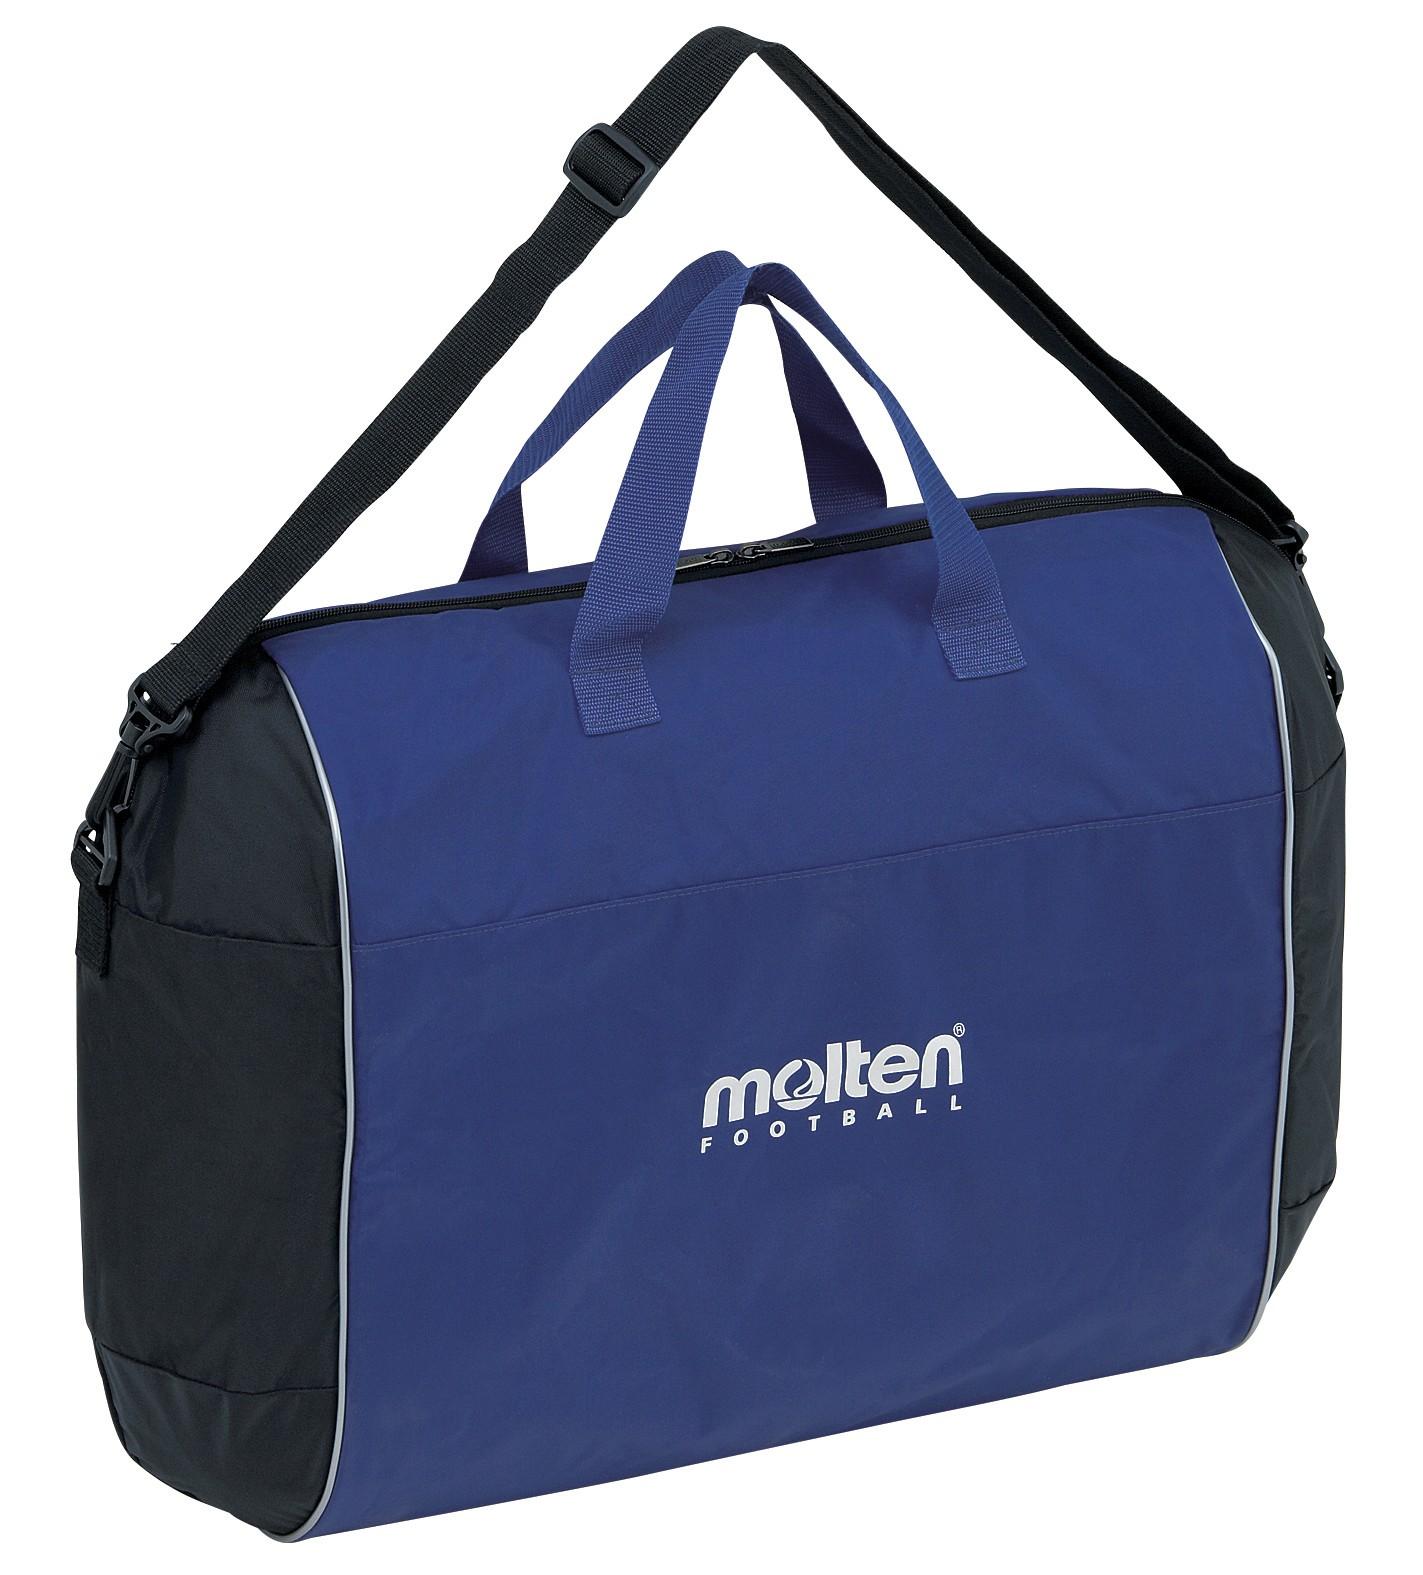 Football Carrying Bag